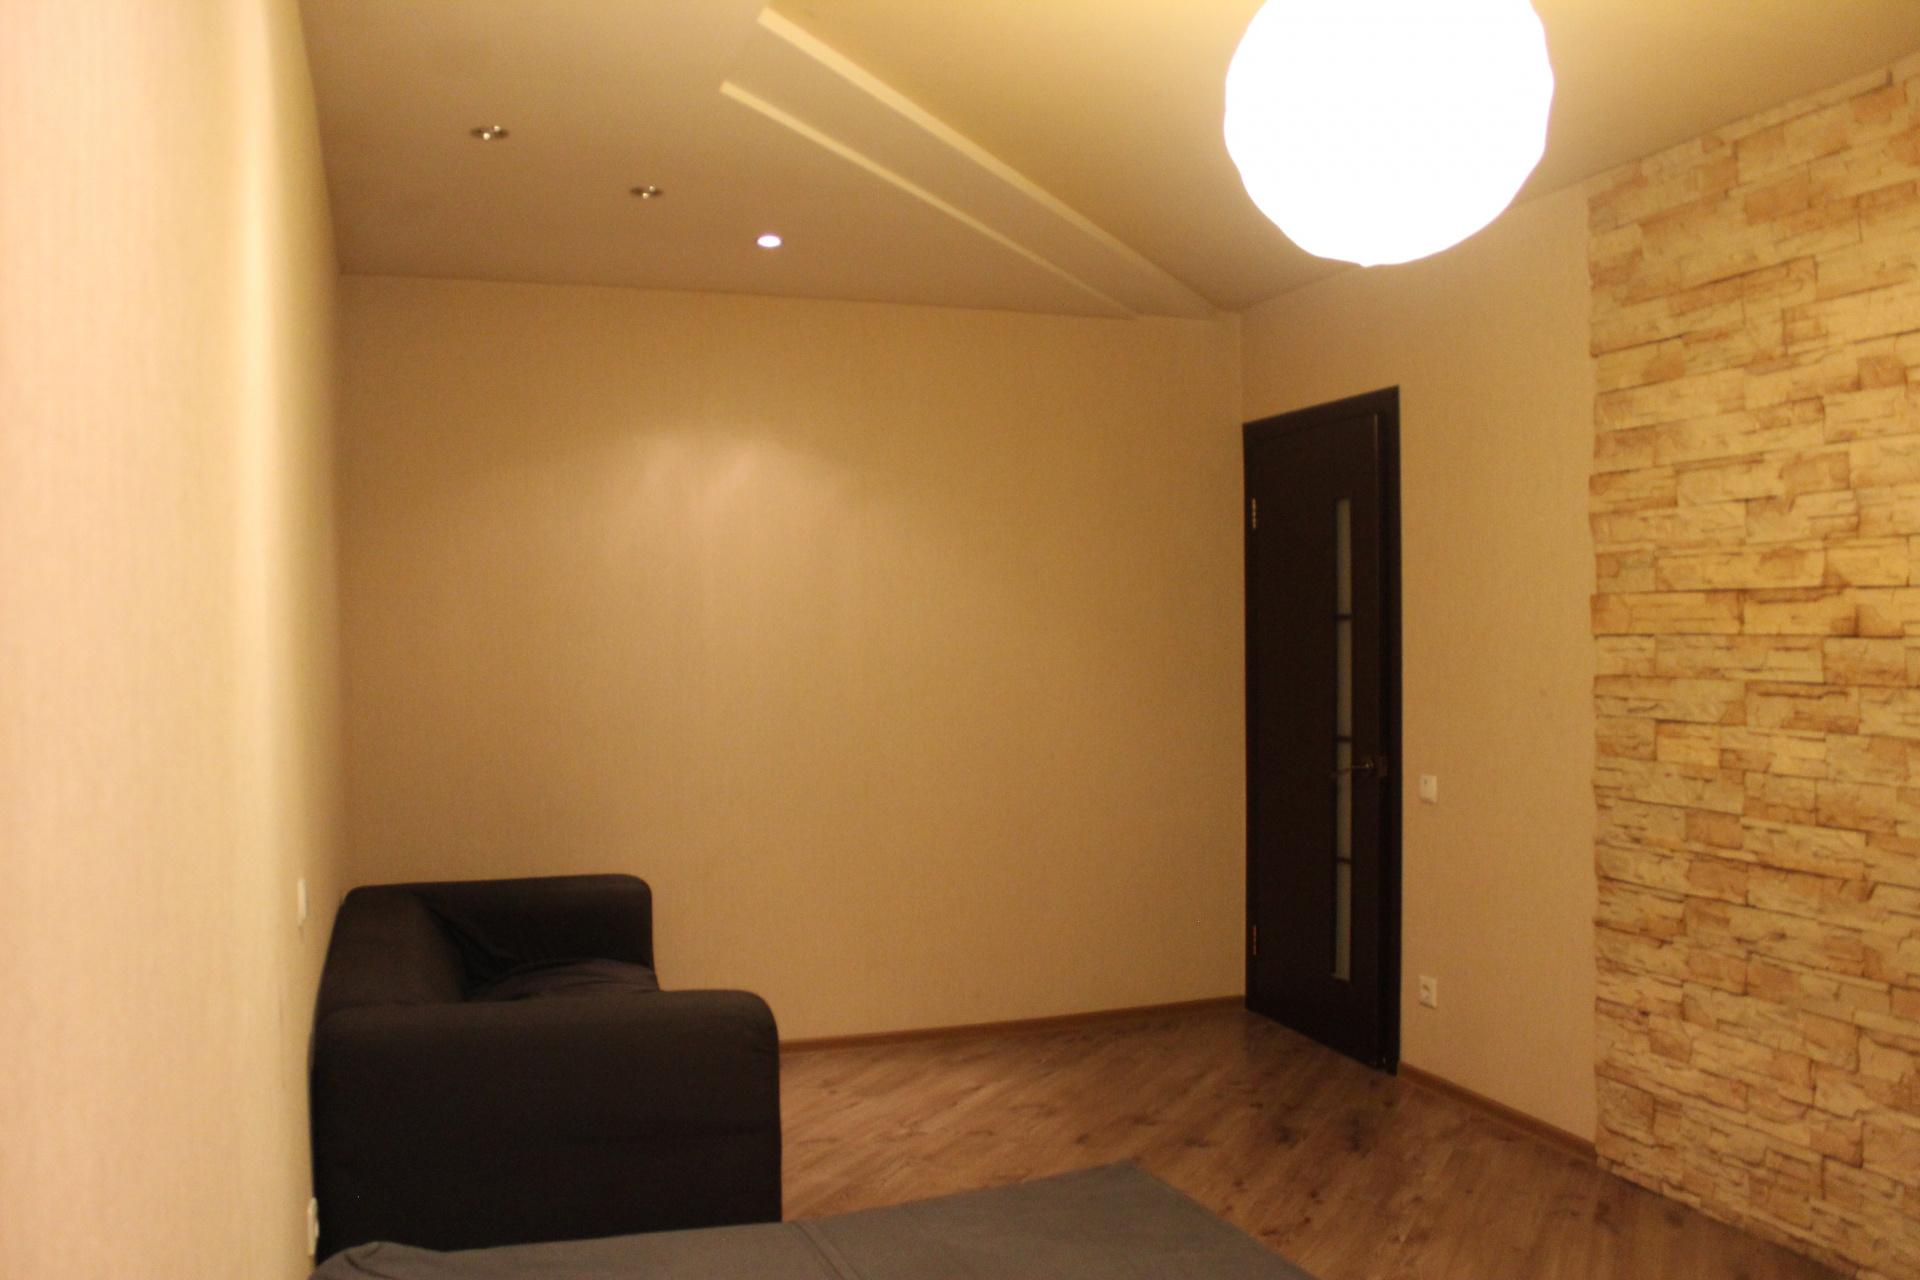 Продажа 3-комнатной квартиры Маршала Казакова ул., 8, к 1, Нижний Новгород